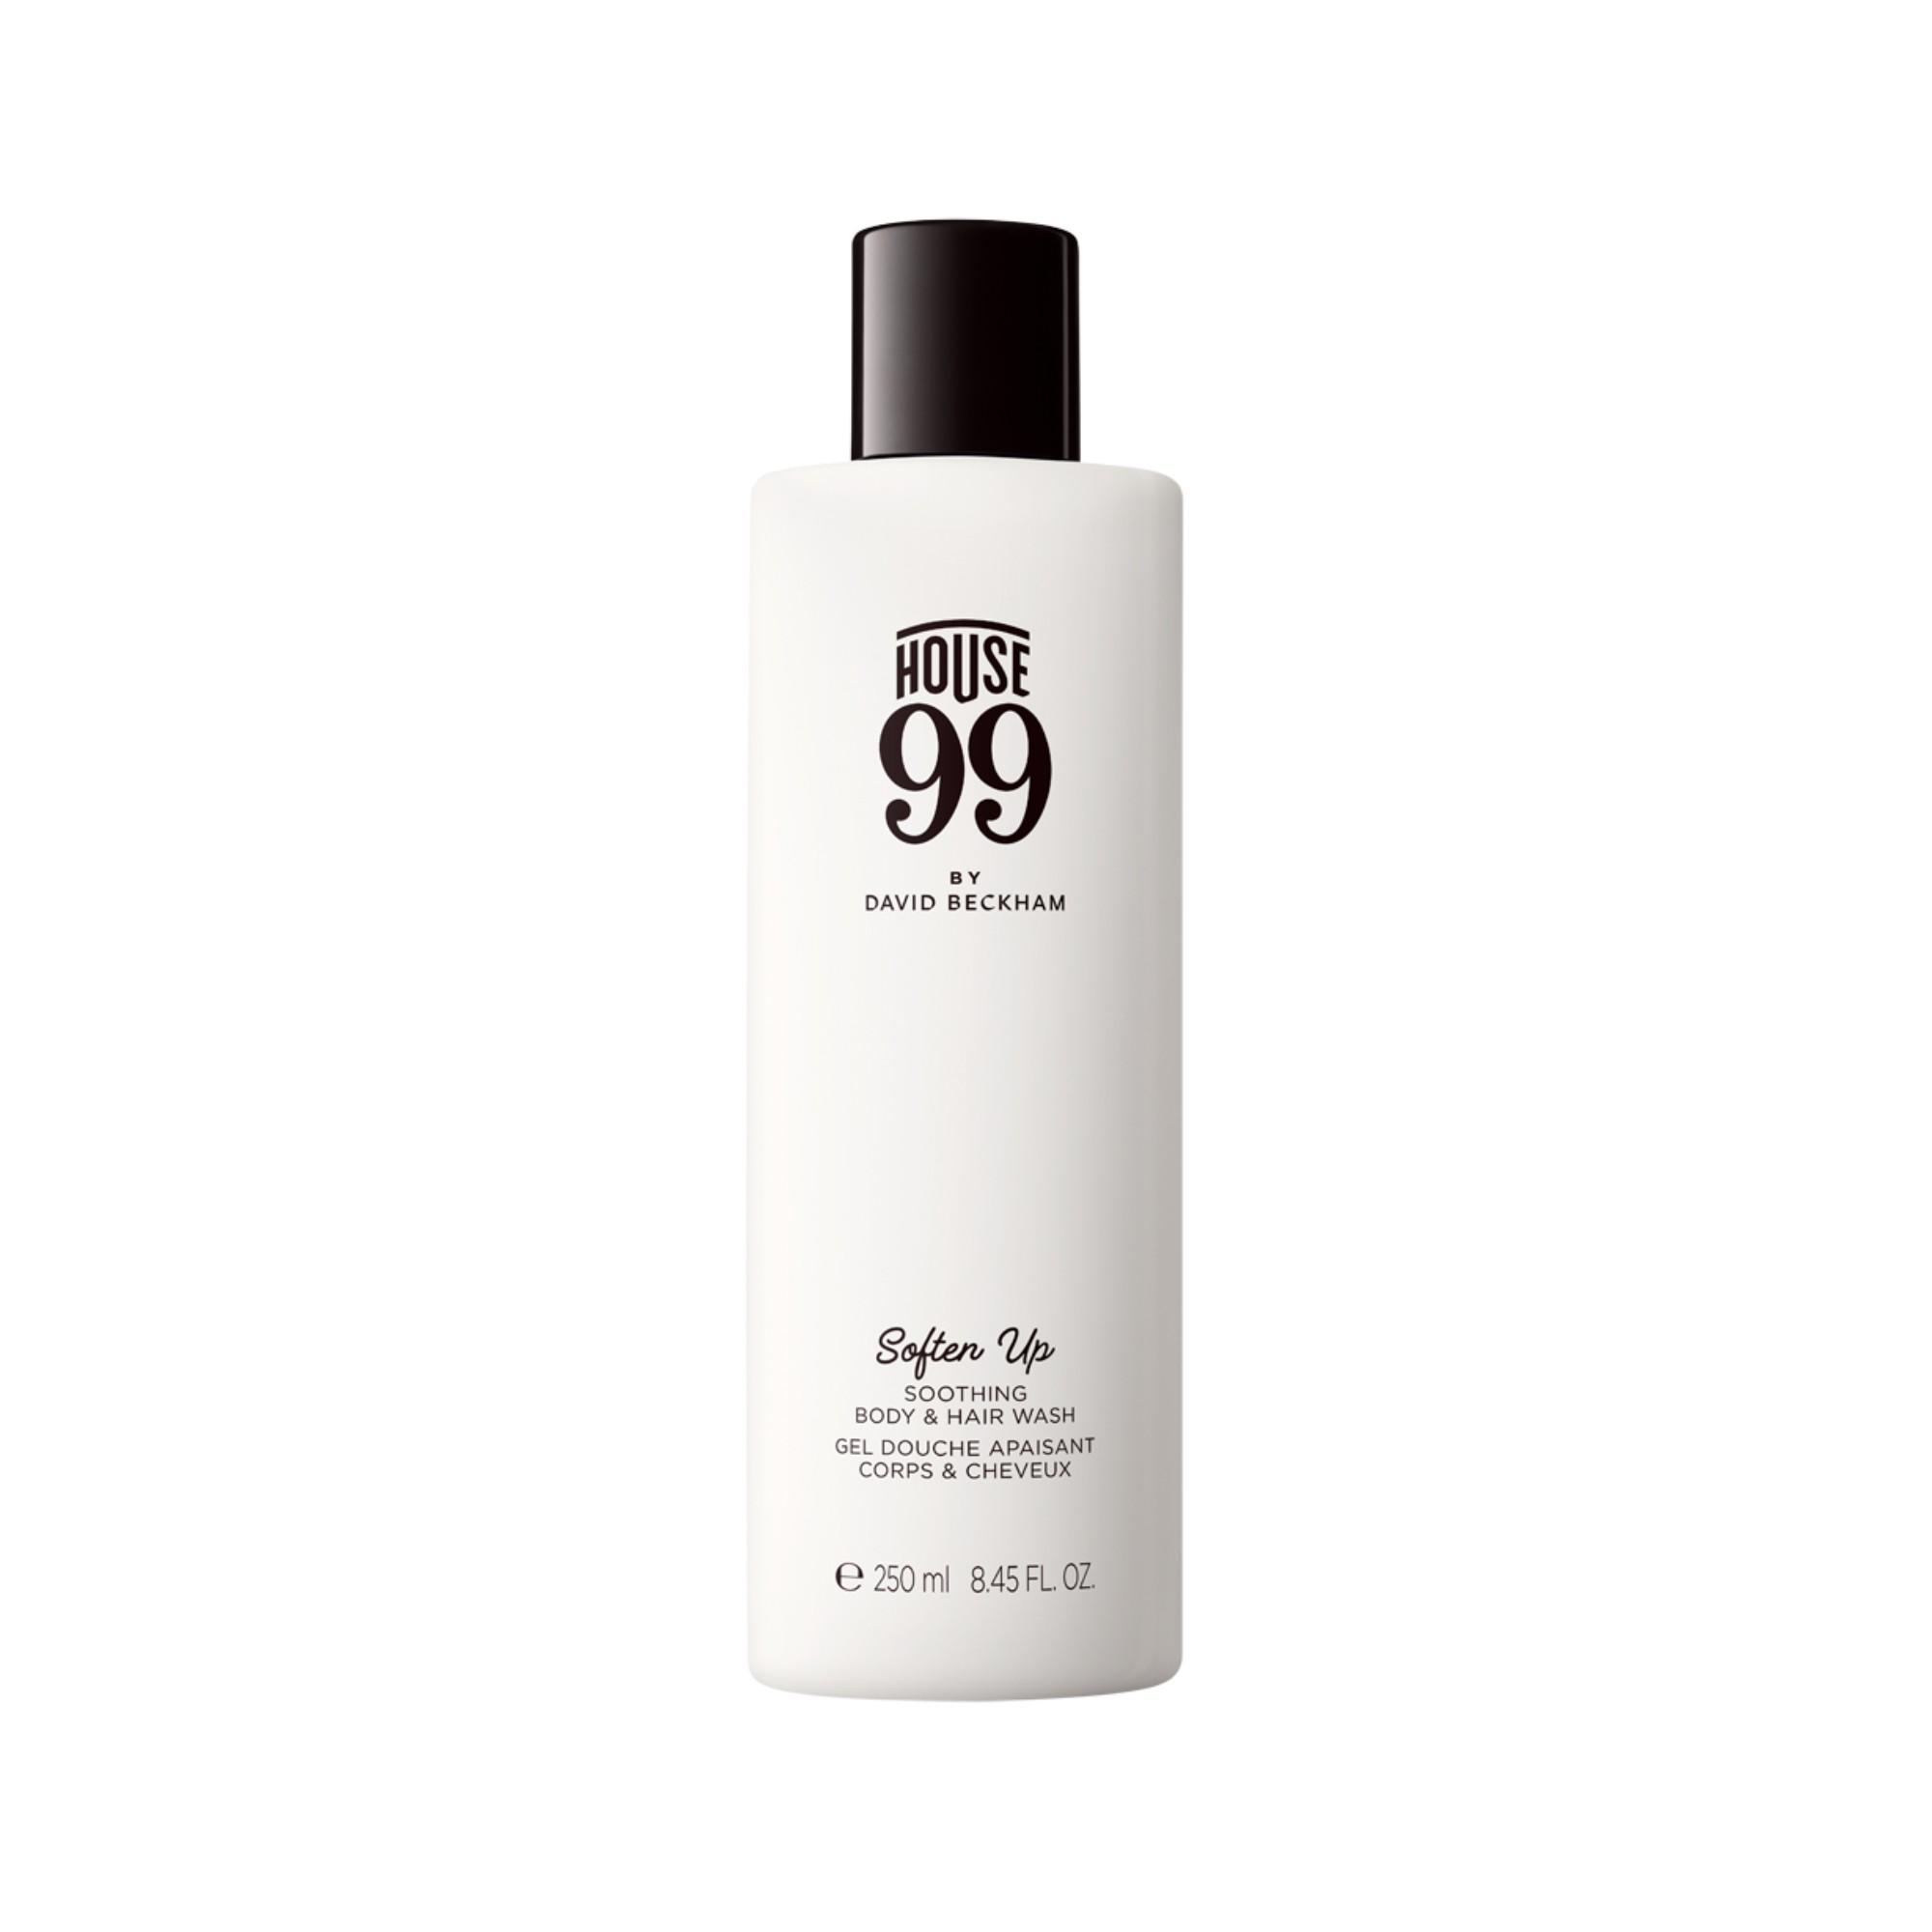 Soften Up Body & Hair Wash 250ml